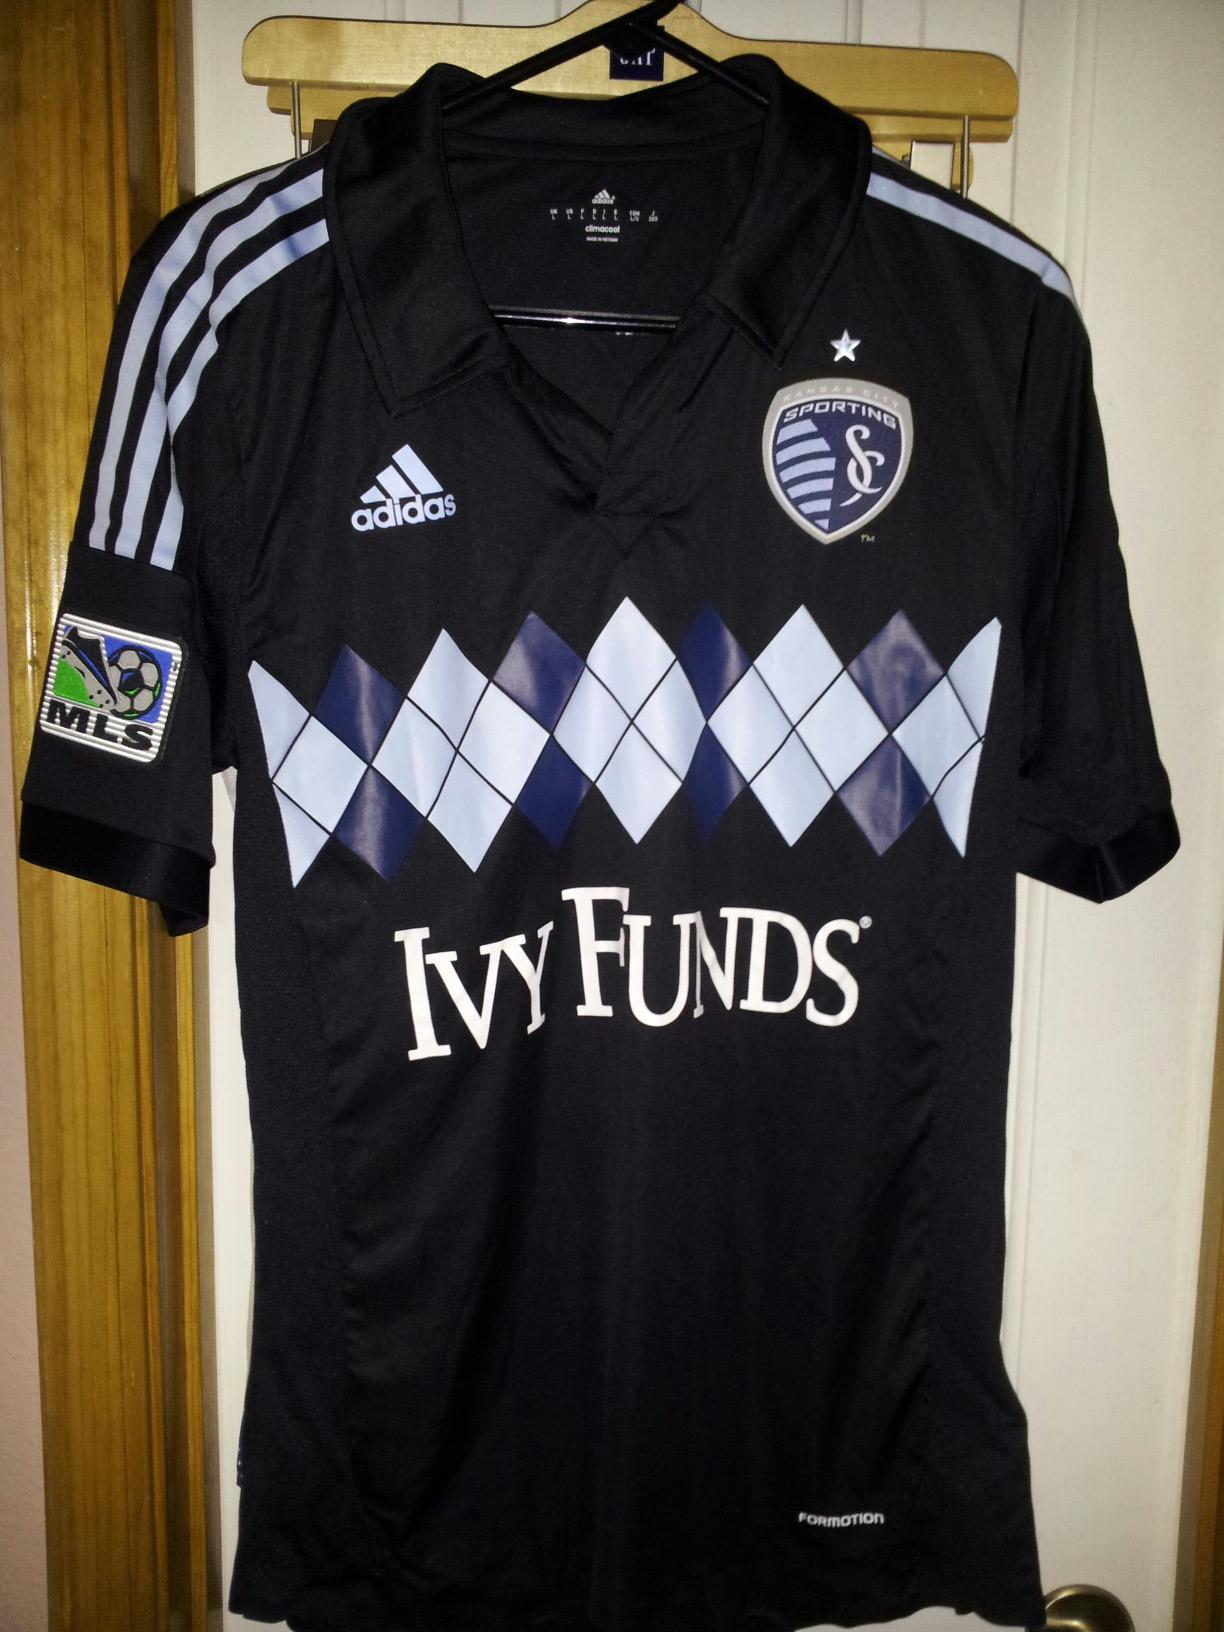 sale retailer 2de6d 9e0e9 File:Sporting Kansas City 3rd jersey kit - 2013.jpg ...